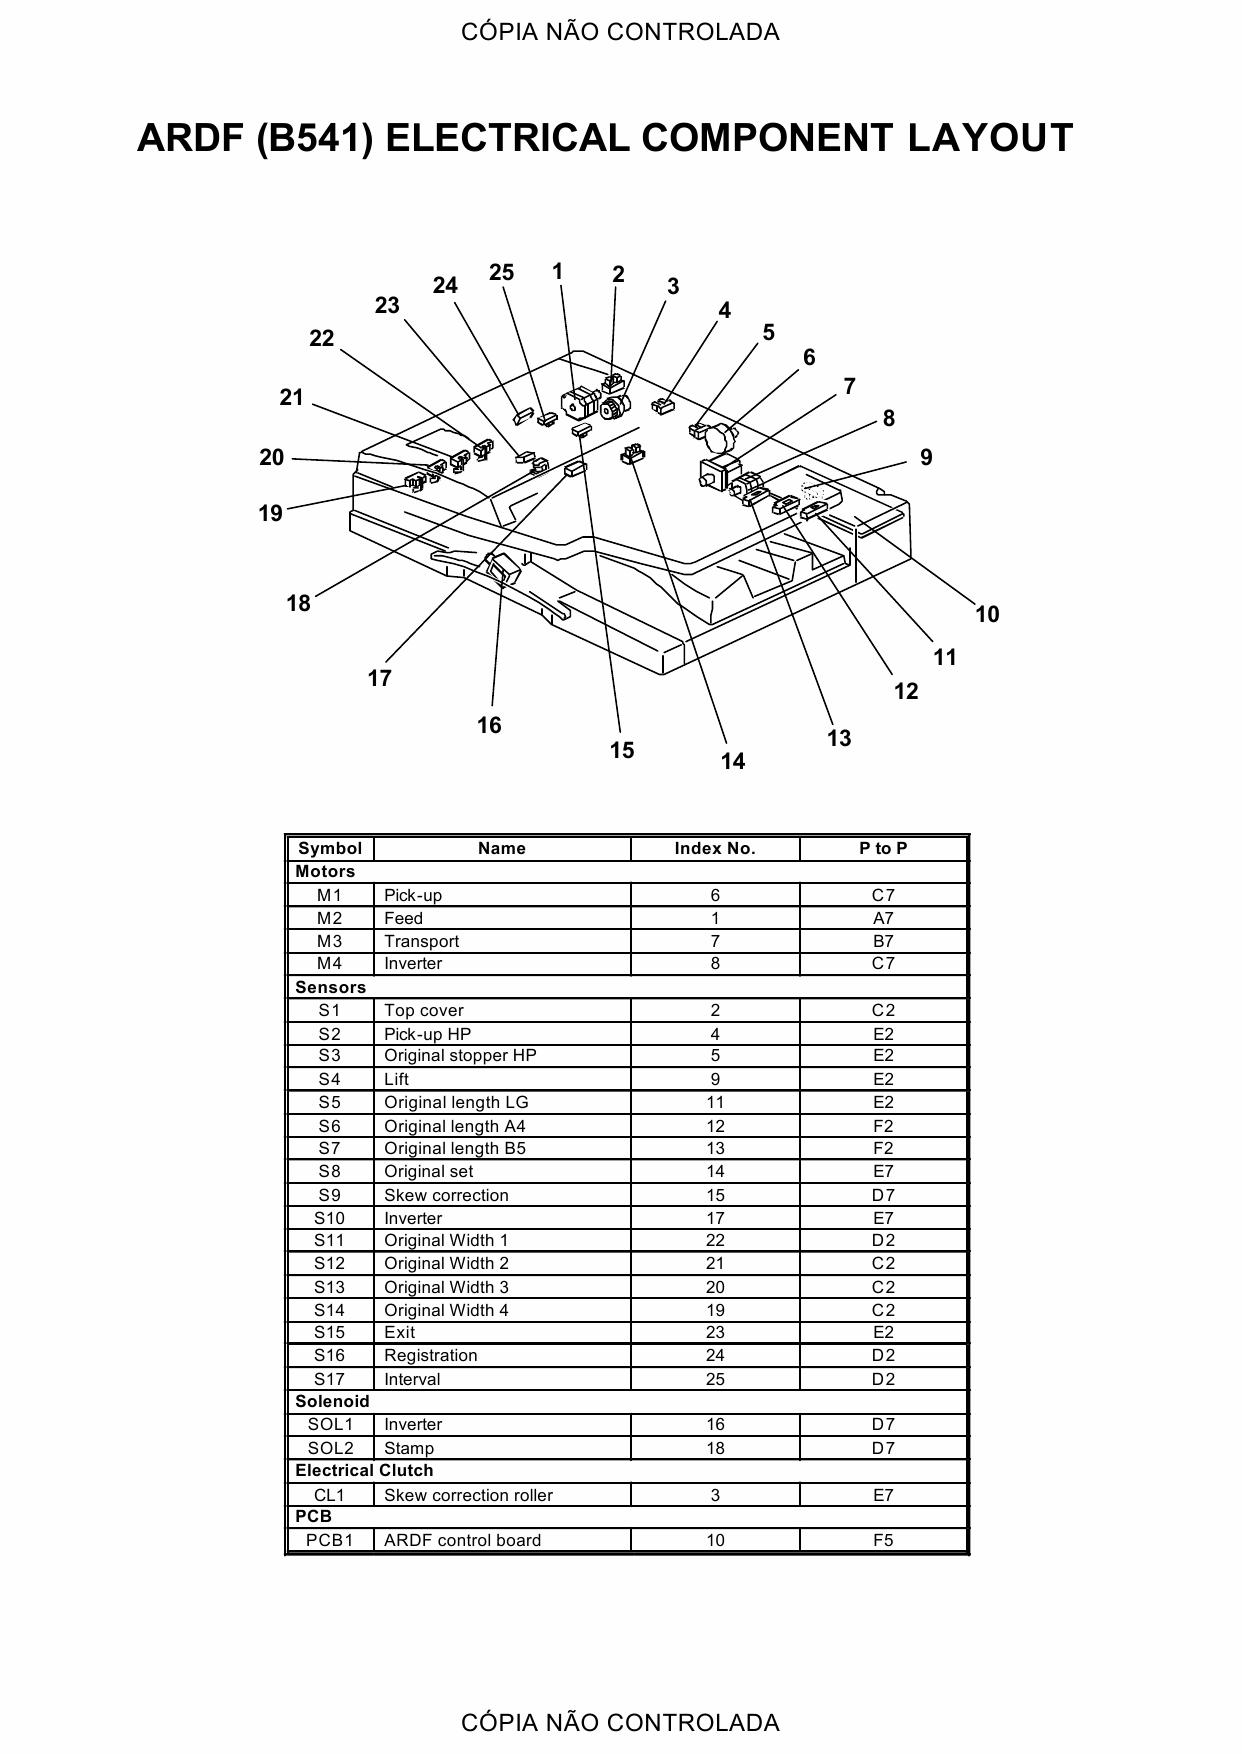 ricoh aficio 2035 2045 b079 b082 circuit diagram ricoh aficio 2035e driver download windows 7 ricoh aficio 2035 manual